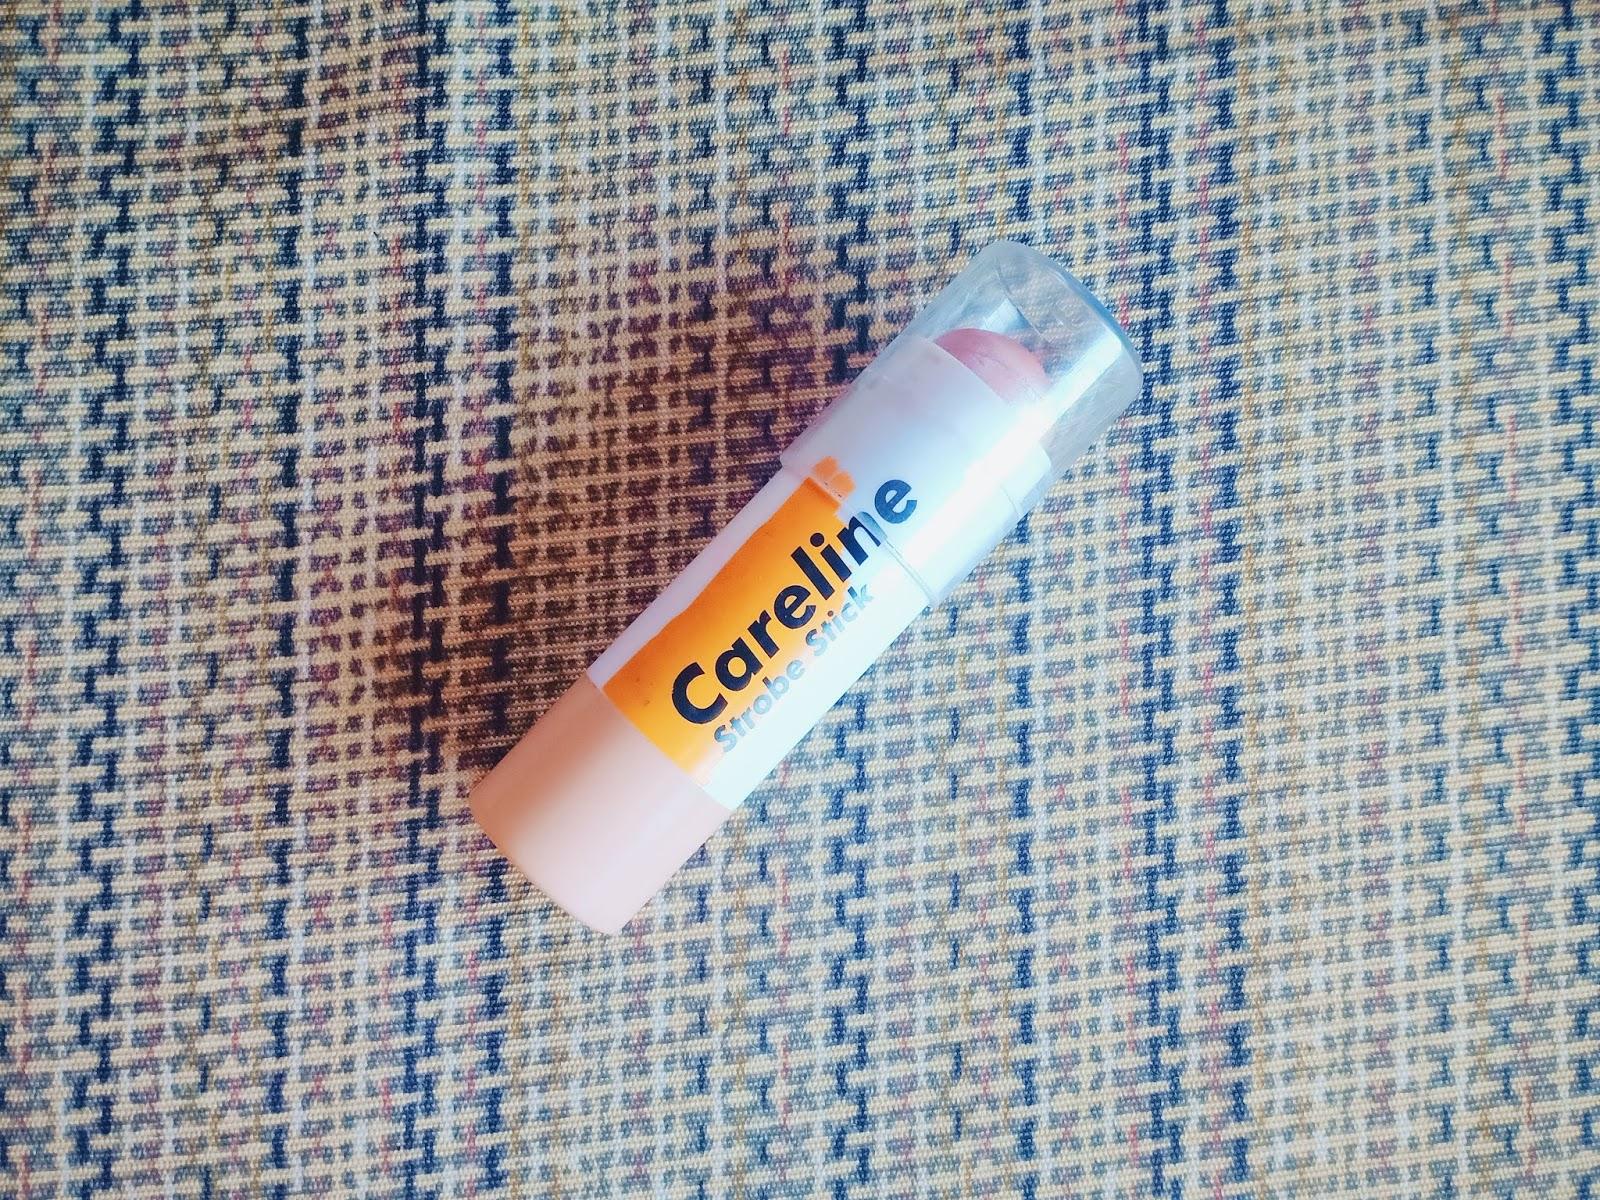 Everyday Makeup Routine Careline Strobe Stick